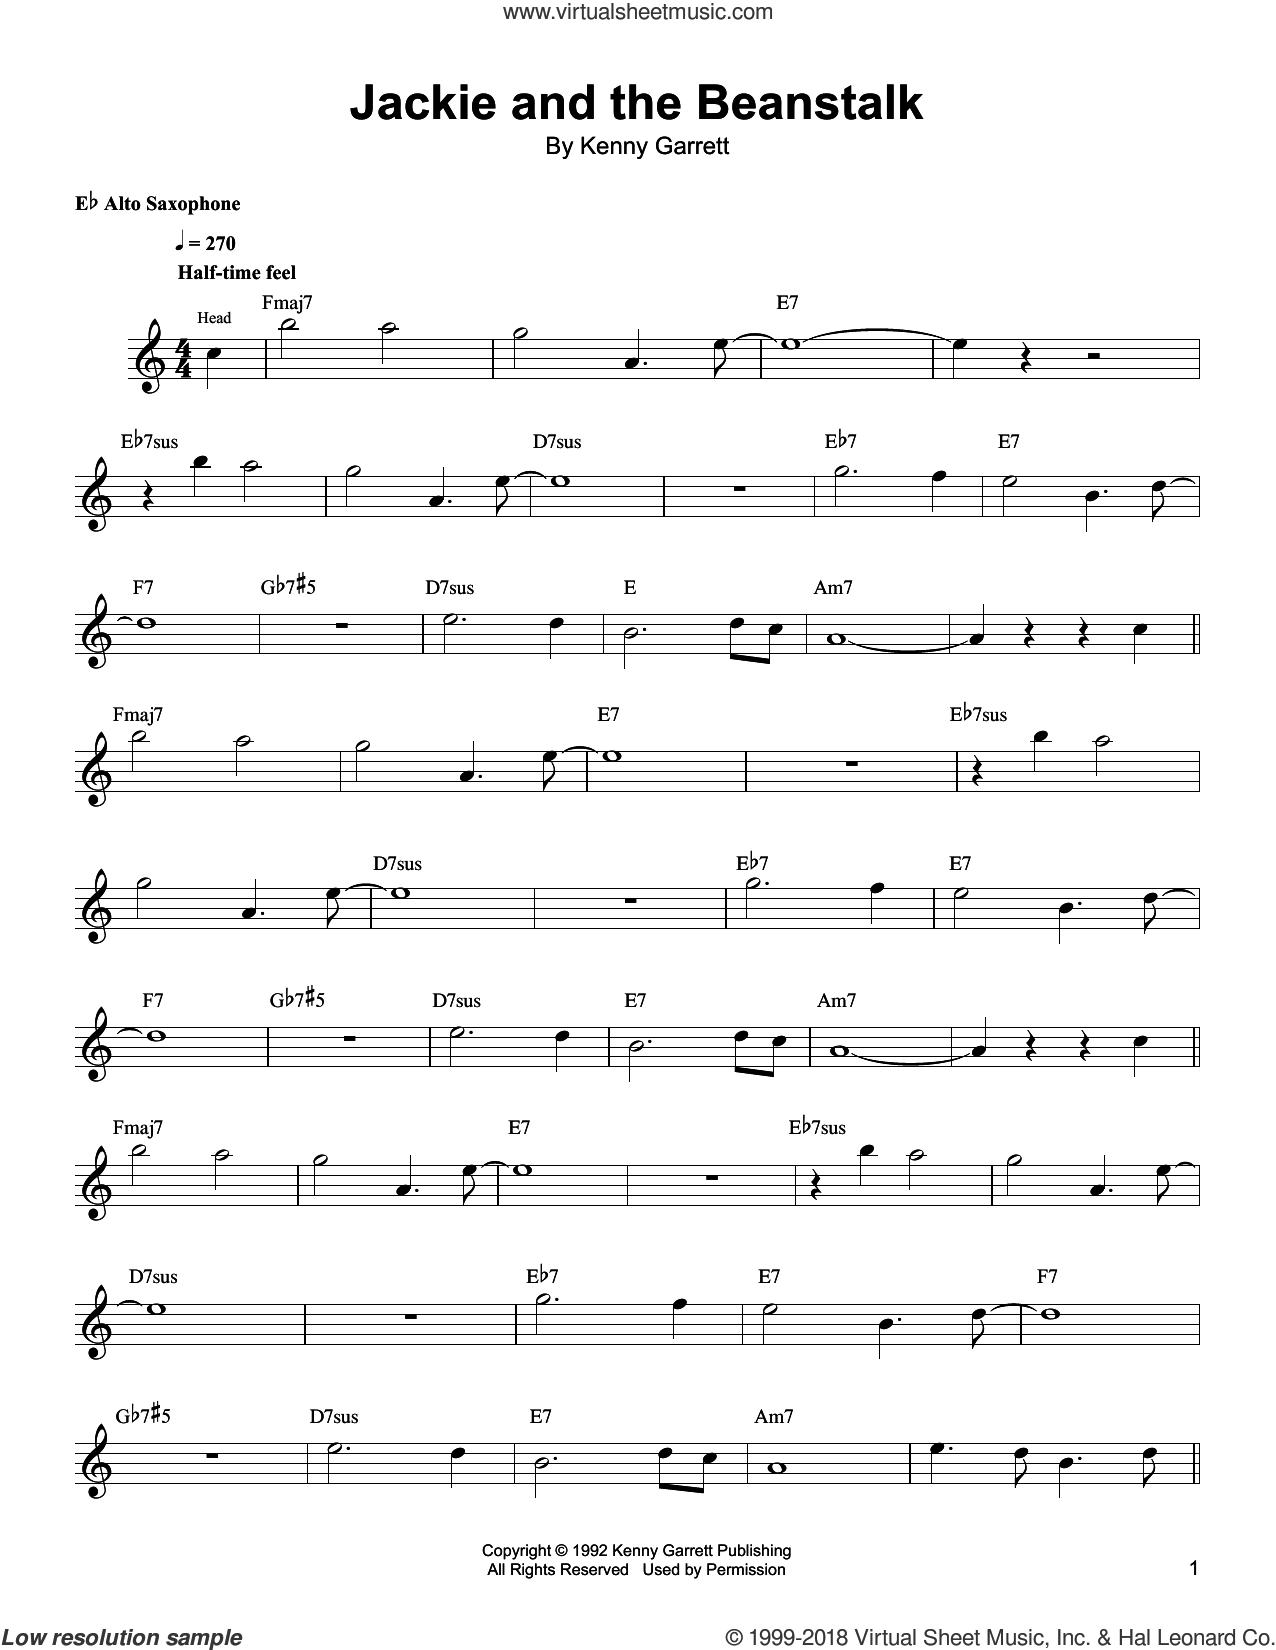 Jackie And The Beanstalk sheet music for alto saxophone (transcription) by Kenny Garrett, intermediate skill level